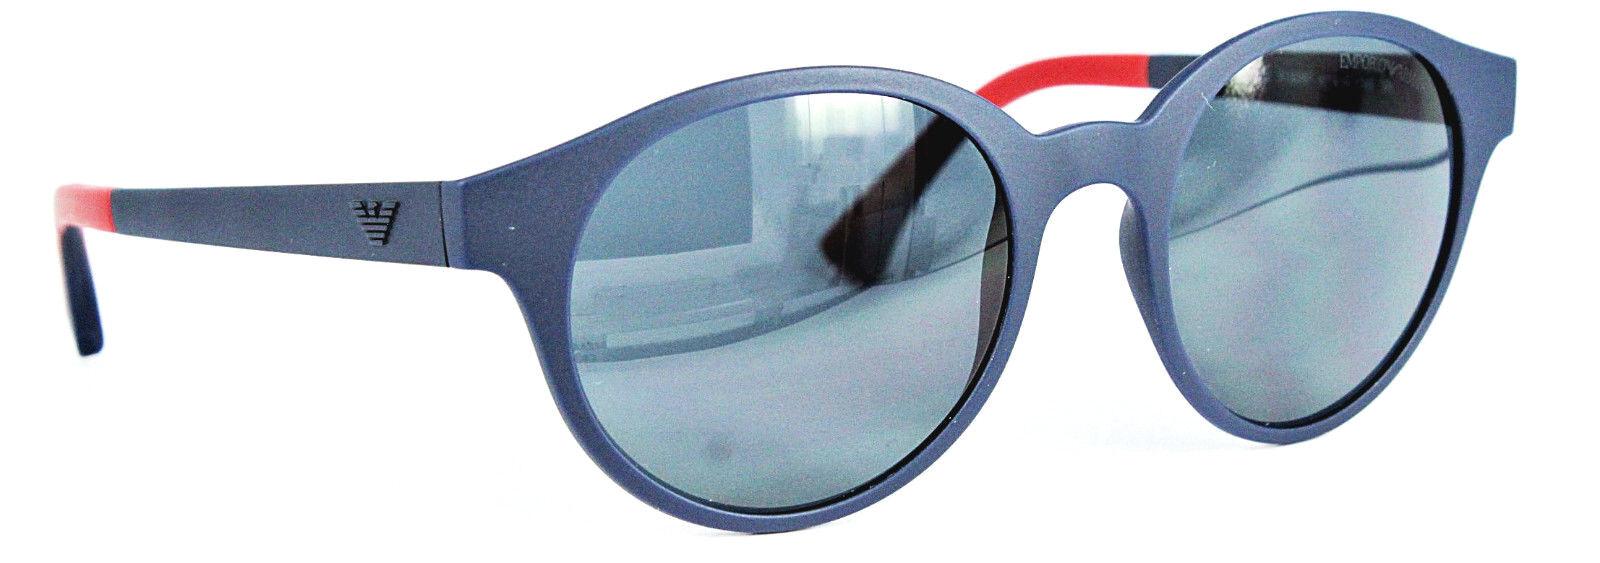 Emporio Armani Sonnenbrille  Sunglasses Sunglasses Sunglasses EA4045 5122 87 Gr.51Konkursaufk  299(72) | Die Königin Der Qualität  1240a4